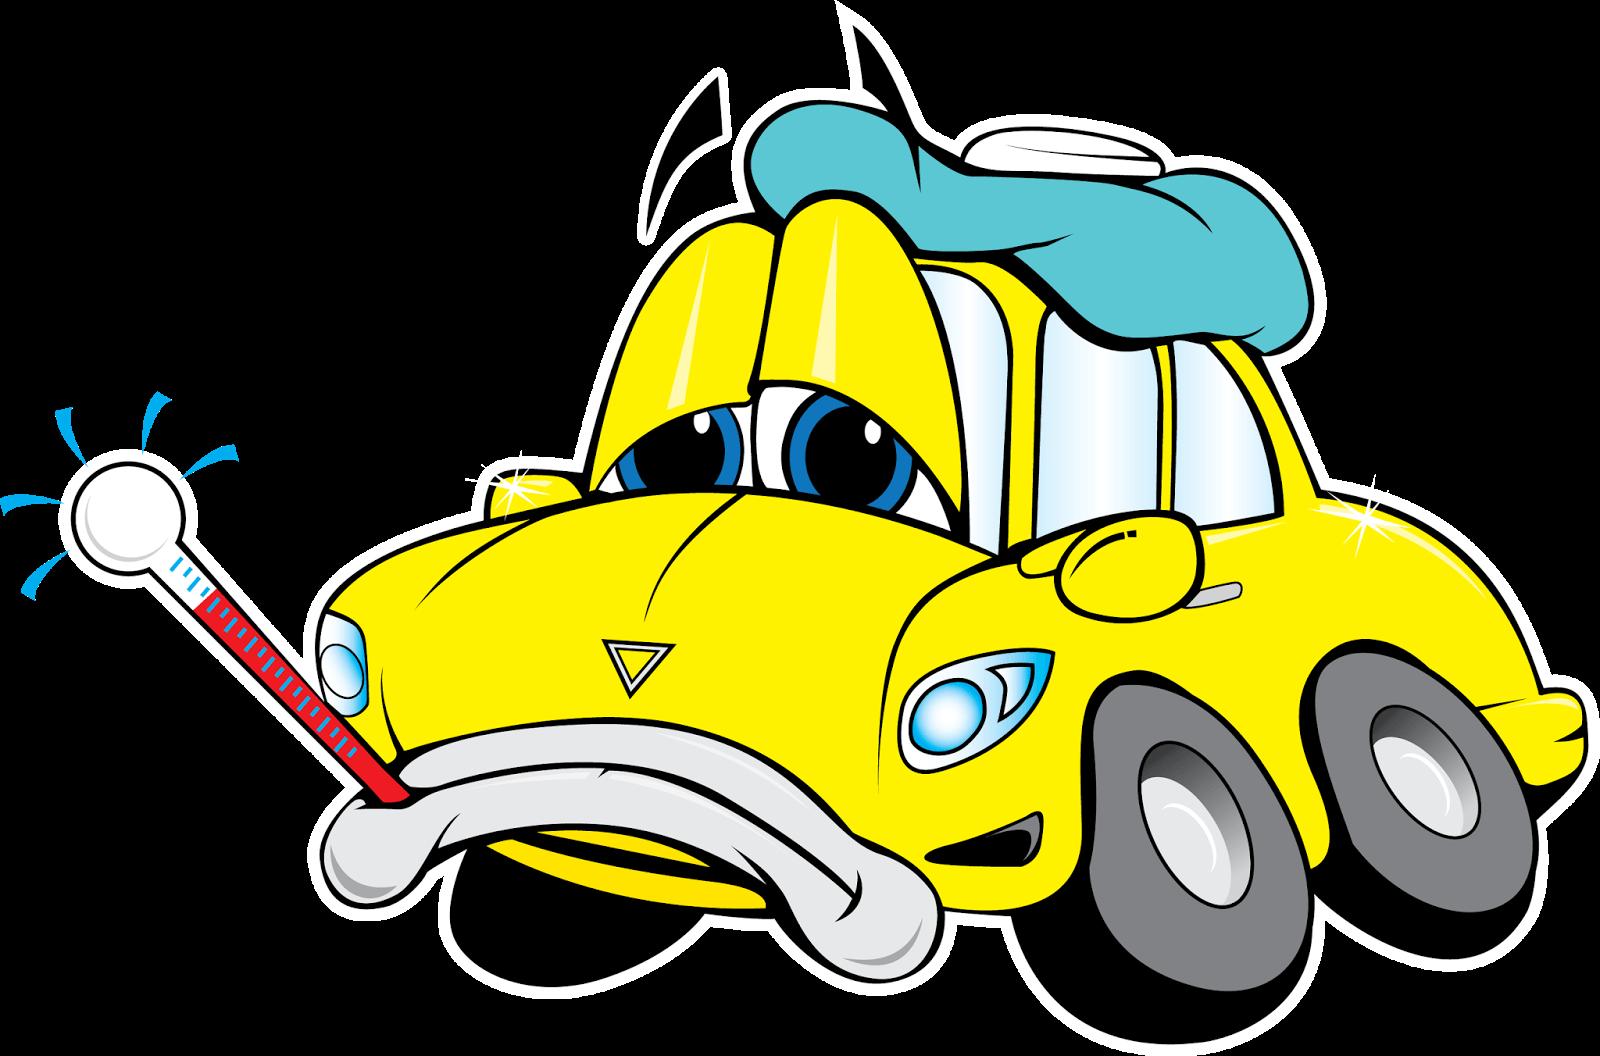 Clipart car wreck jpg library download Junk Car Cliparts - Cliparts Zone jpg library download